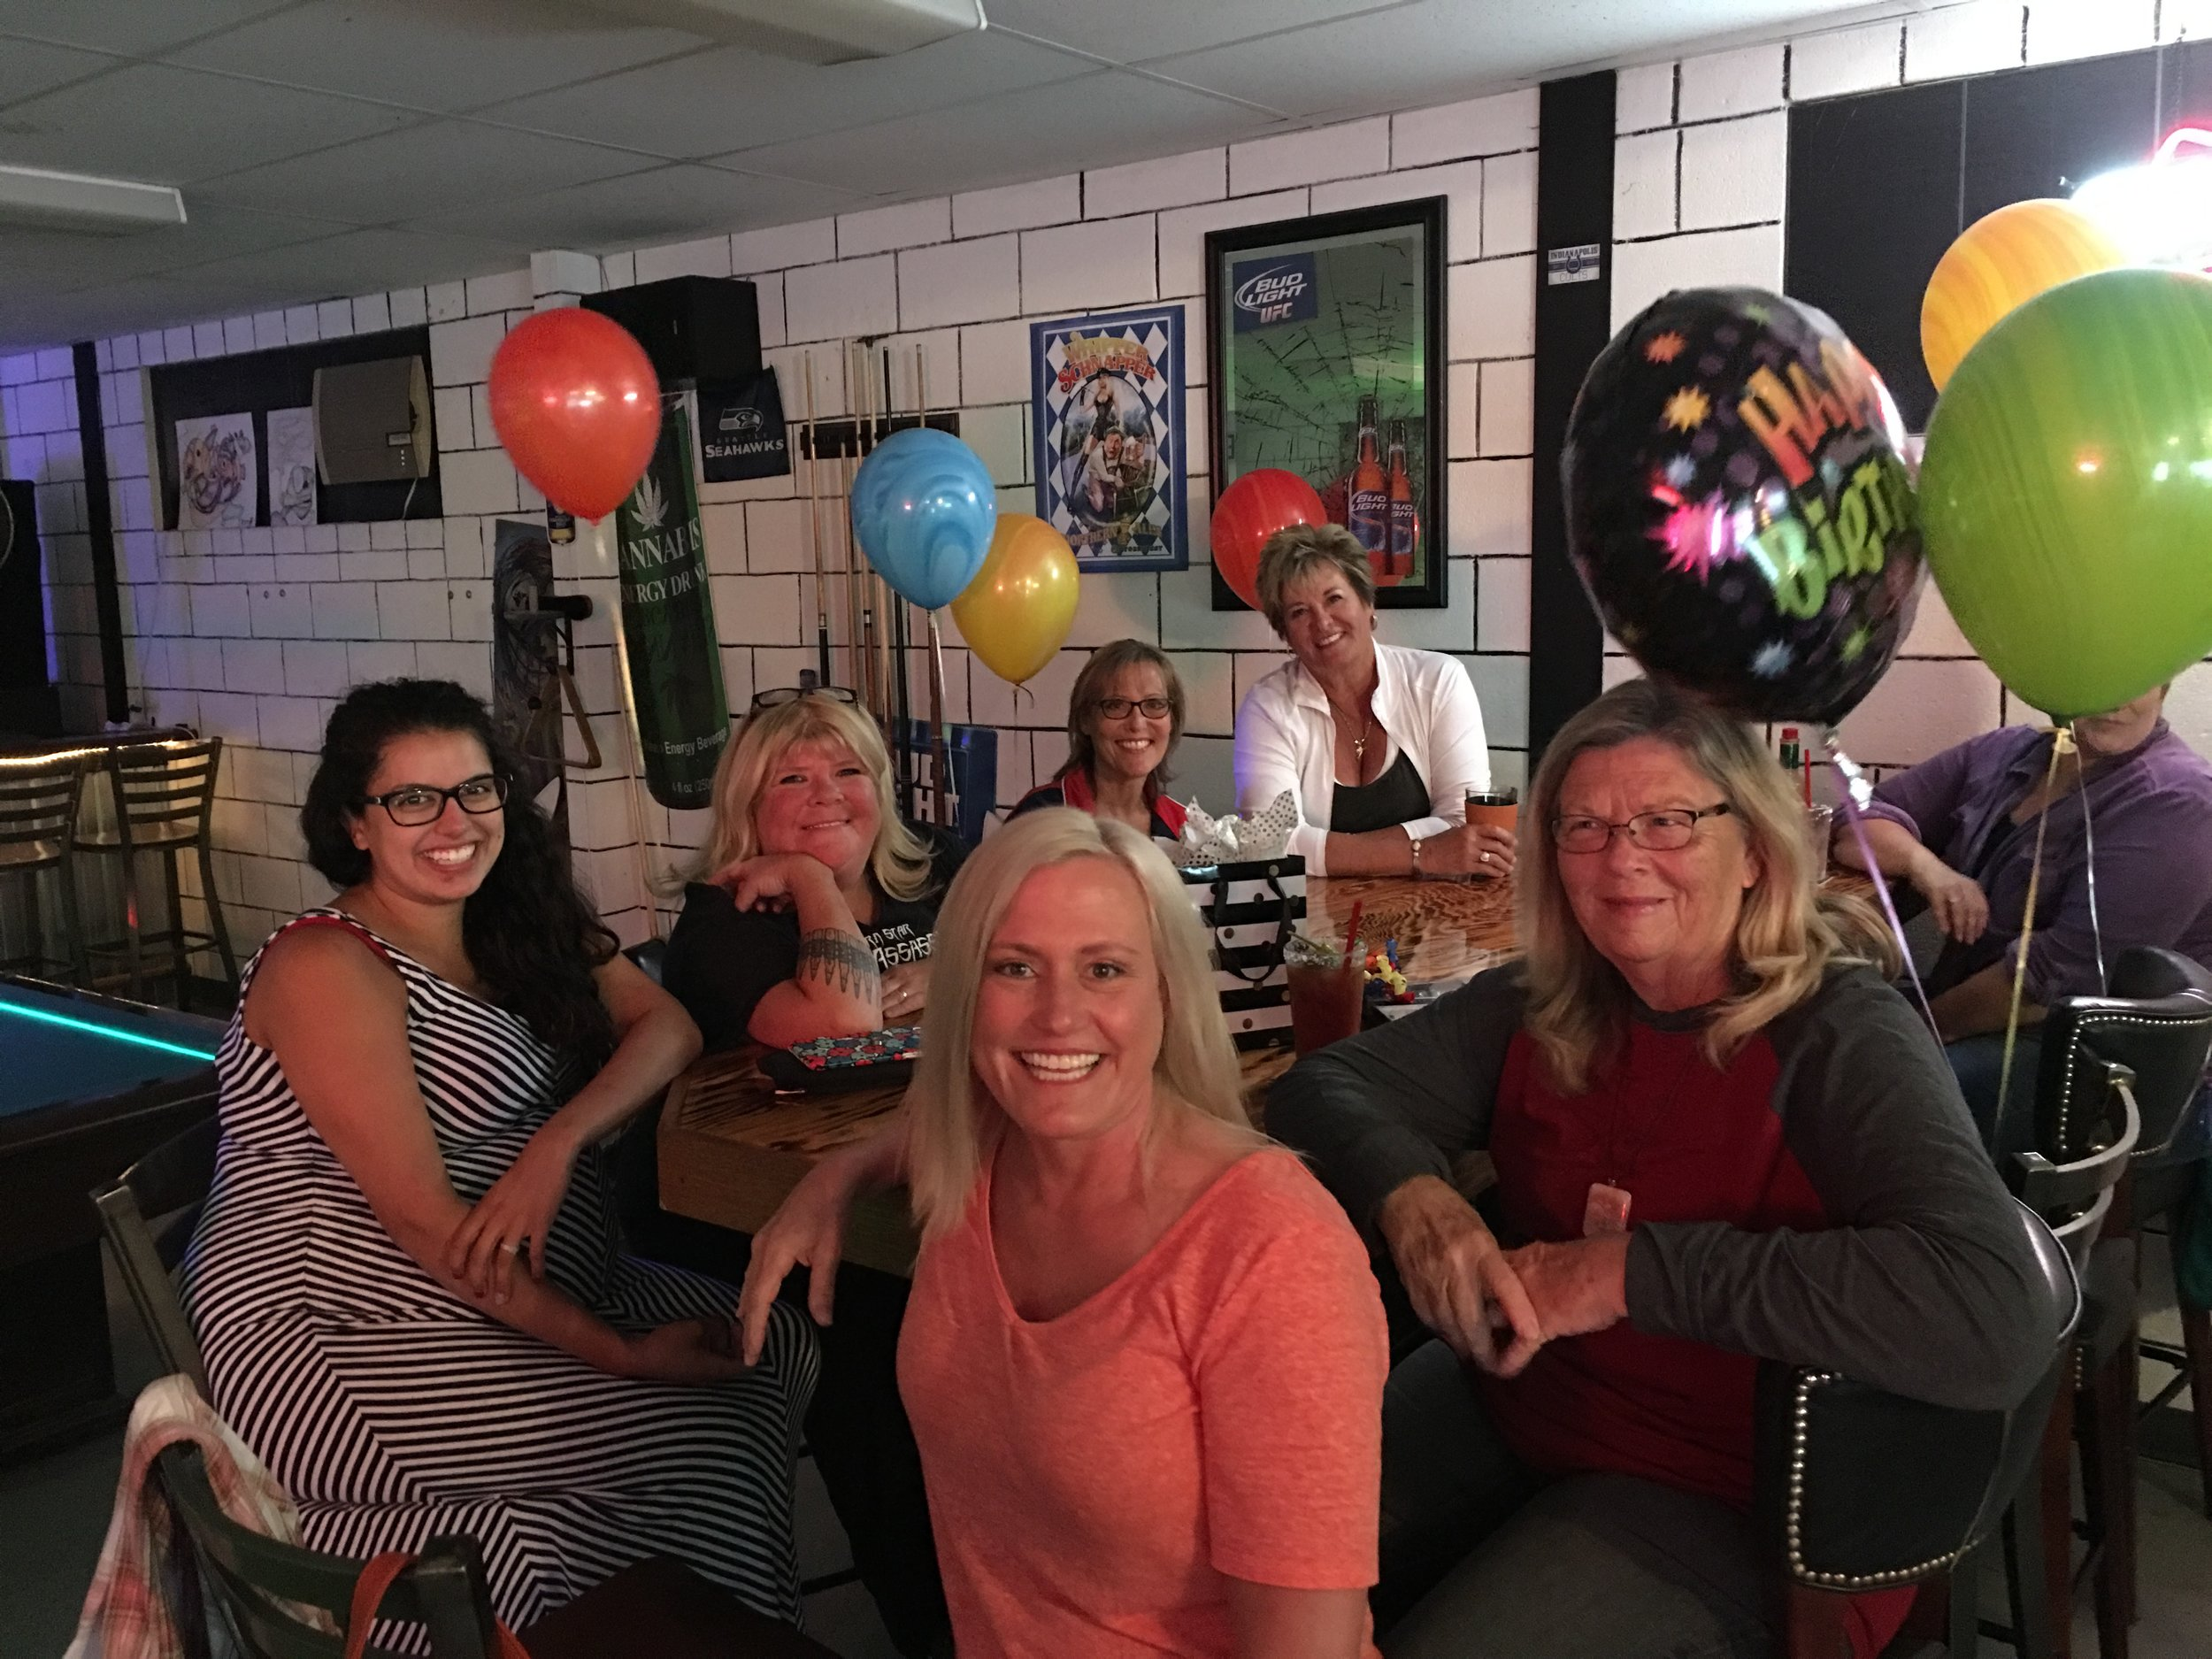 I love my friends! Alexa, Stacey, Belinda, Sara, Nicki behind the green balloon, and Sue.